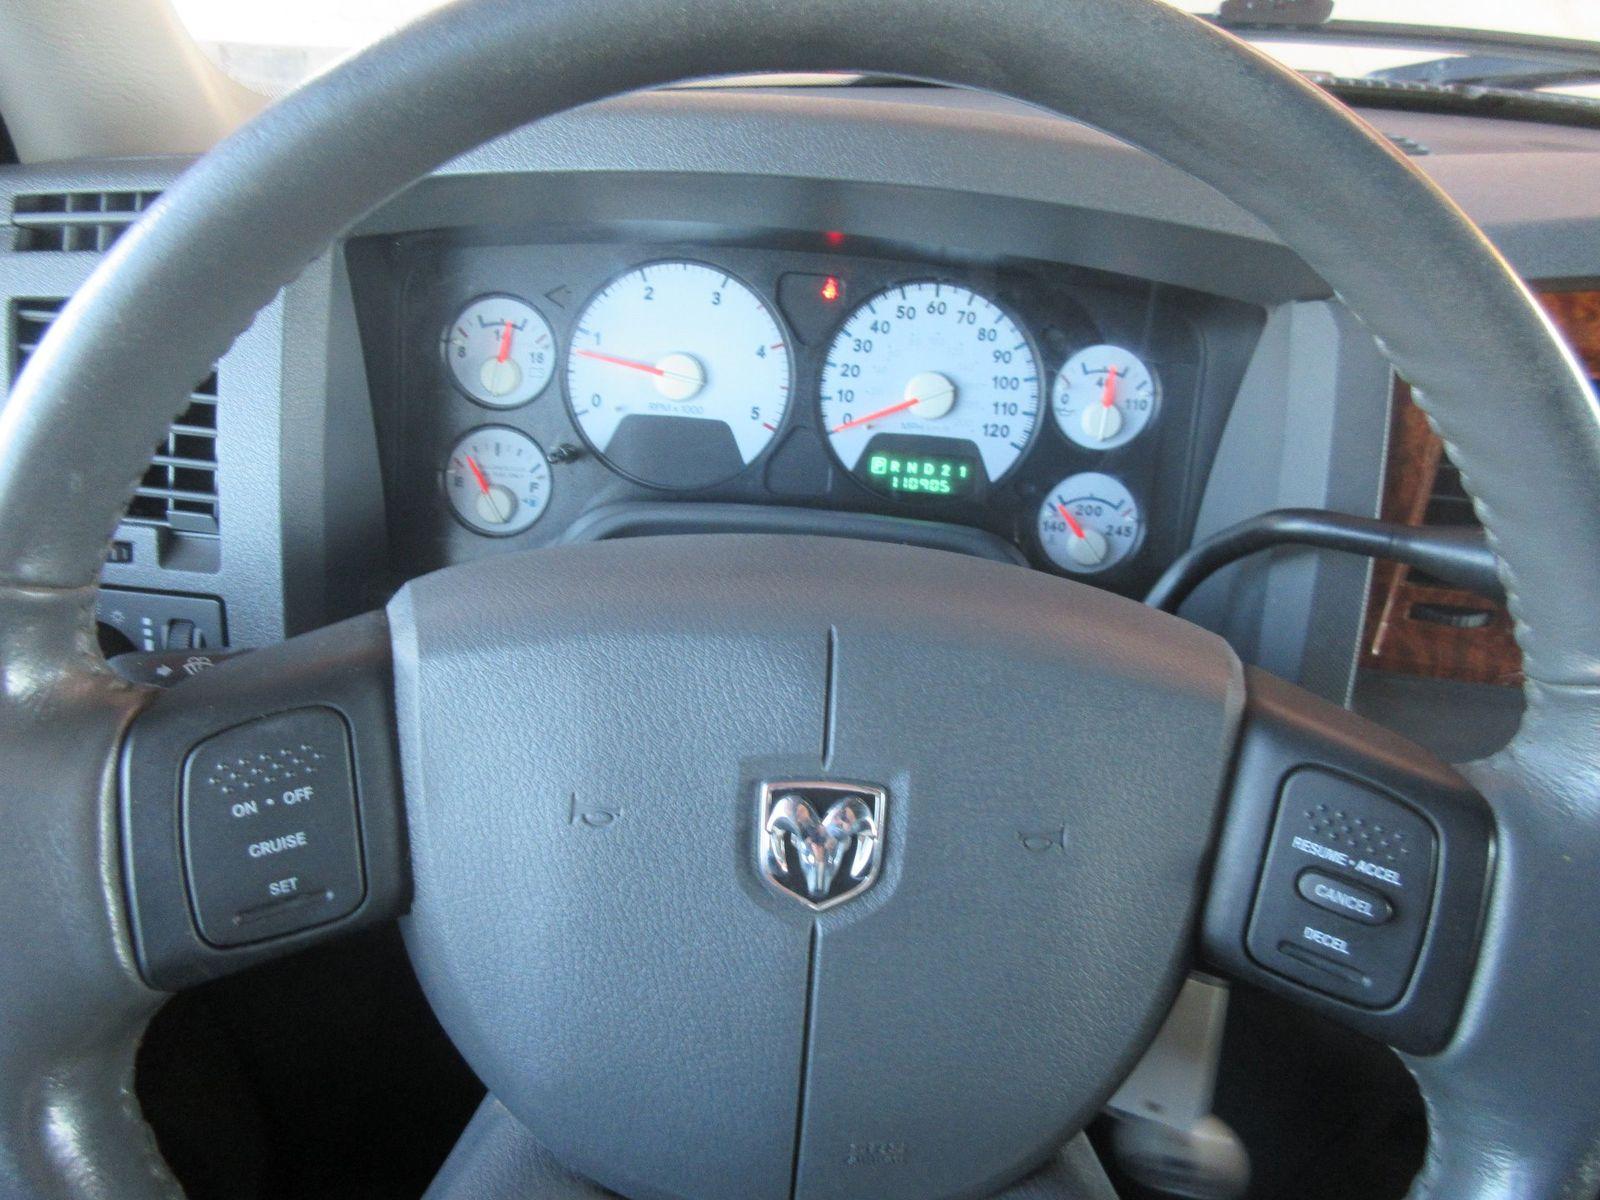 2006 Dodge Ram 2500 Mega Cab 4x4 Slt 59l Fultons Used Cars Inc In Colorado